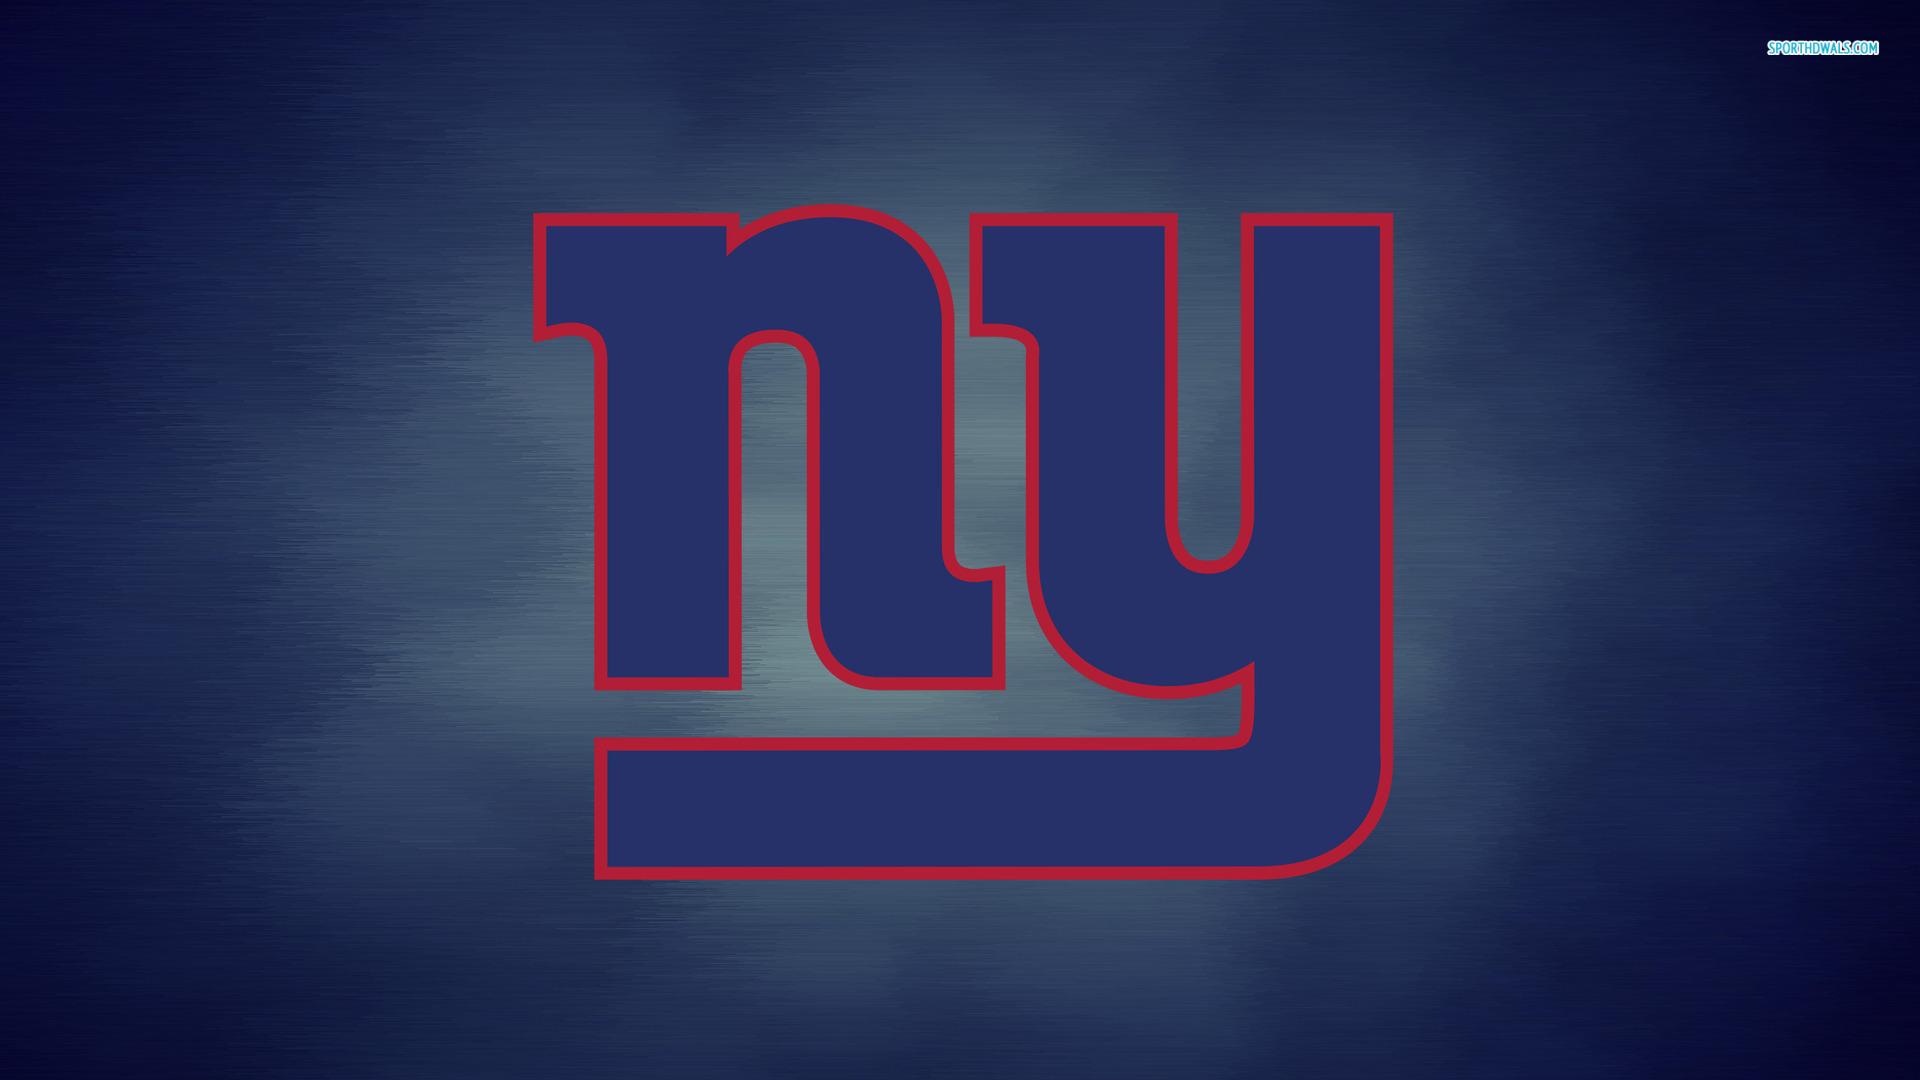 Knicks Iphone Wallpaper New York Giants Nfl Football R Wallpaper 1920x1080